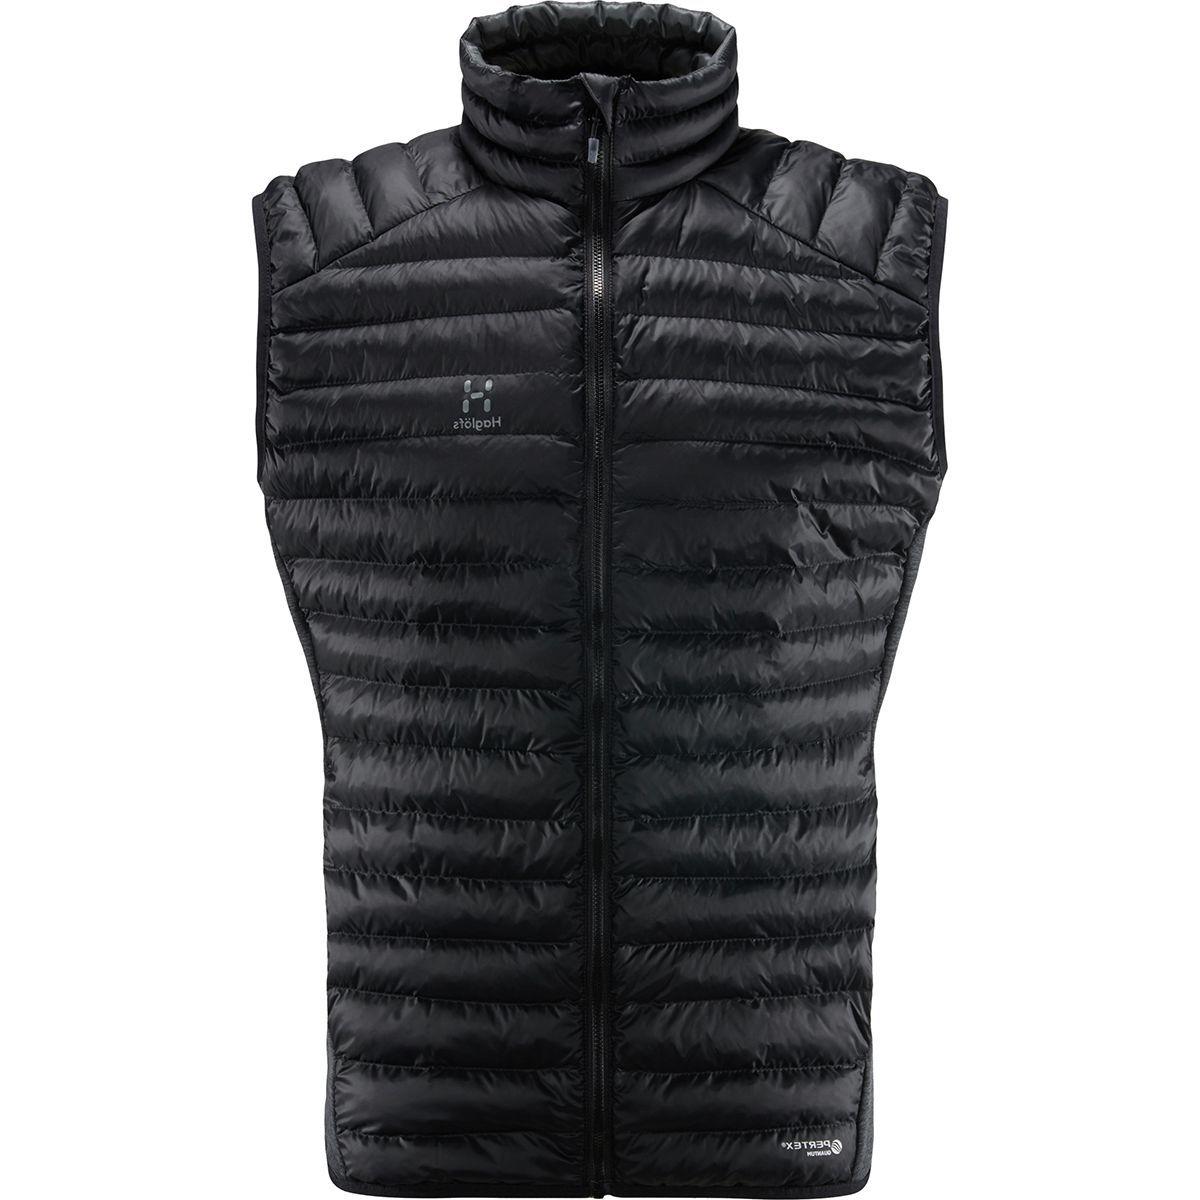 Haglofs Essens Mimic Insulated Vest - Men's